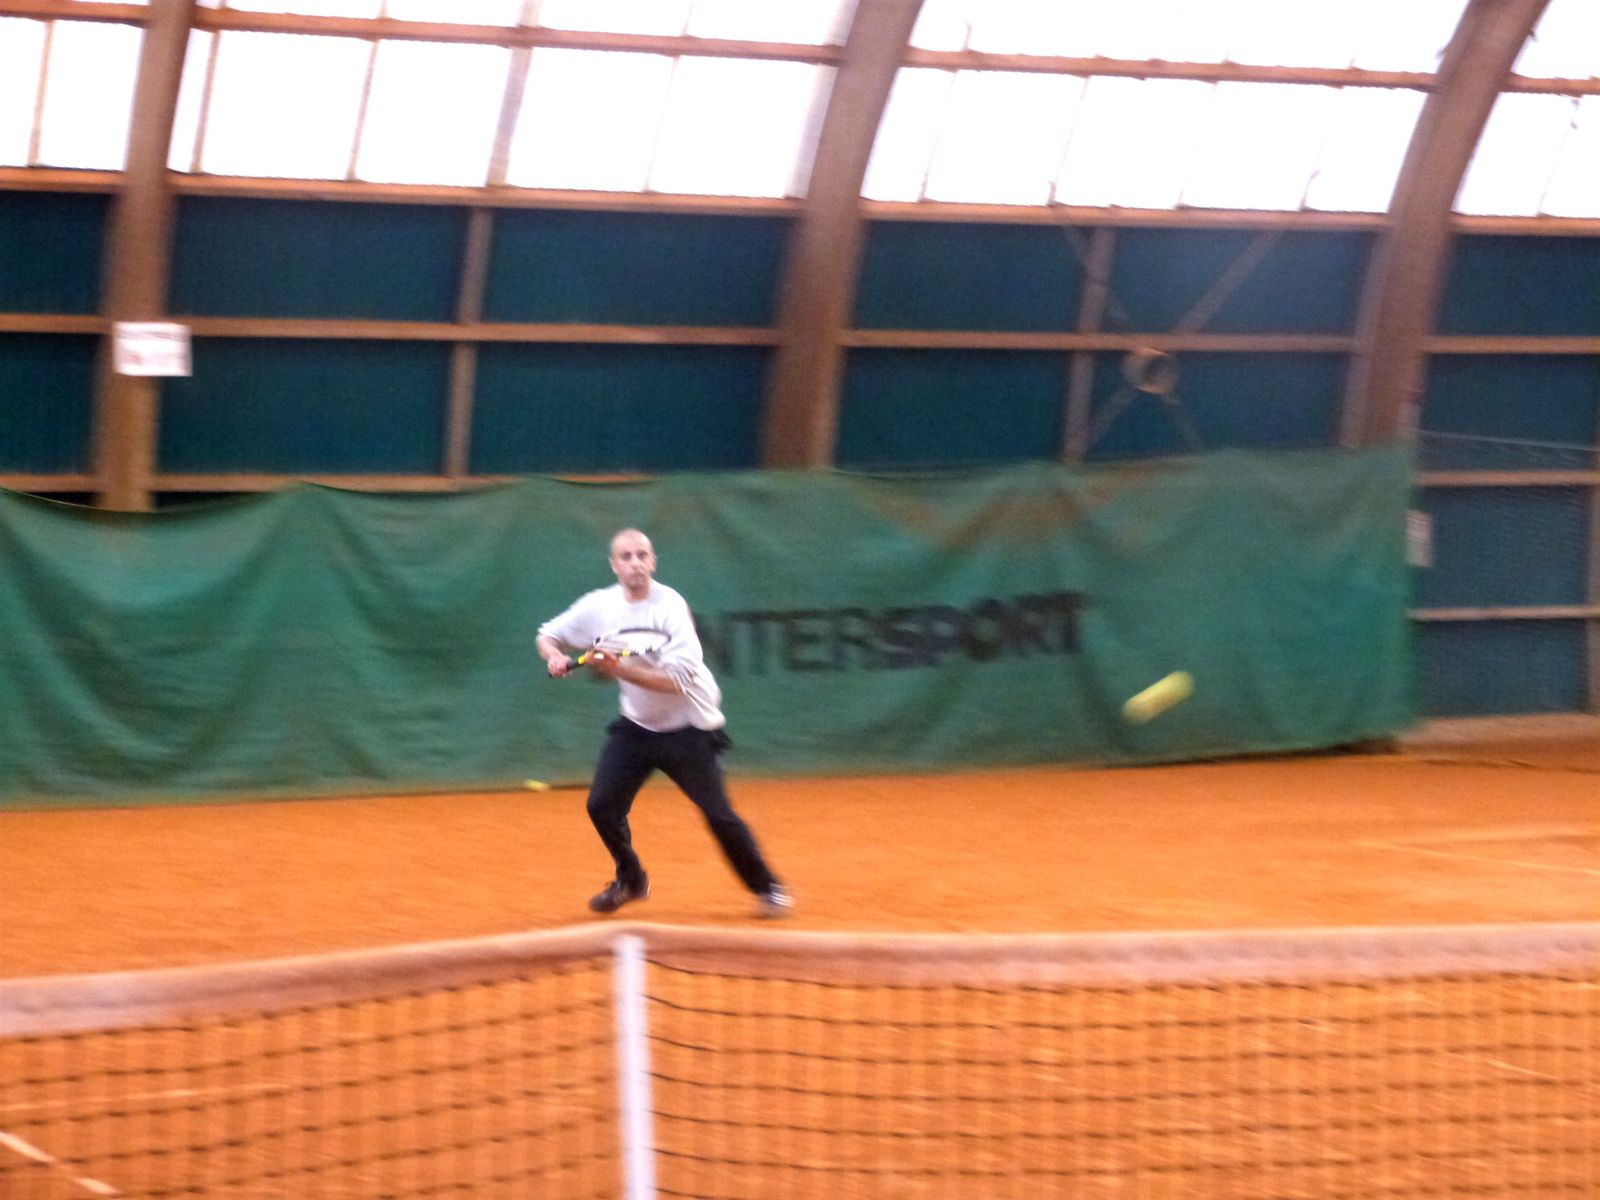 initiation tennis, février 2015 : Aleksänder, John, Redi, Farid